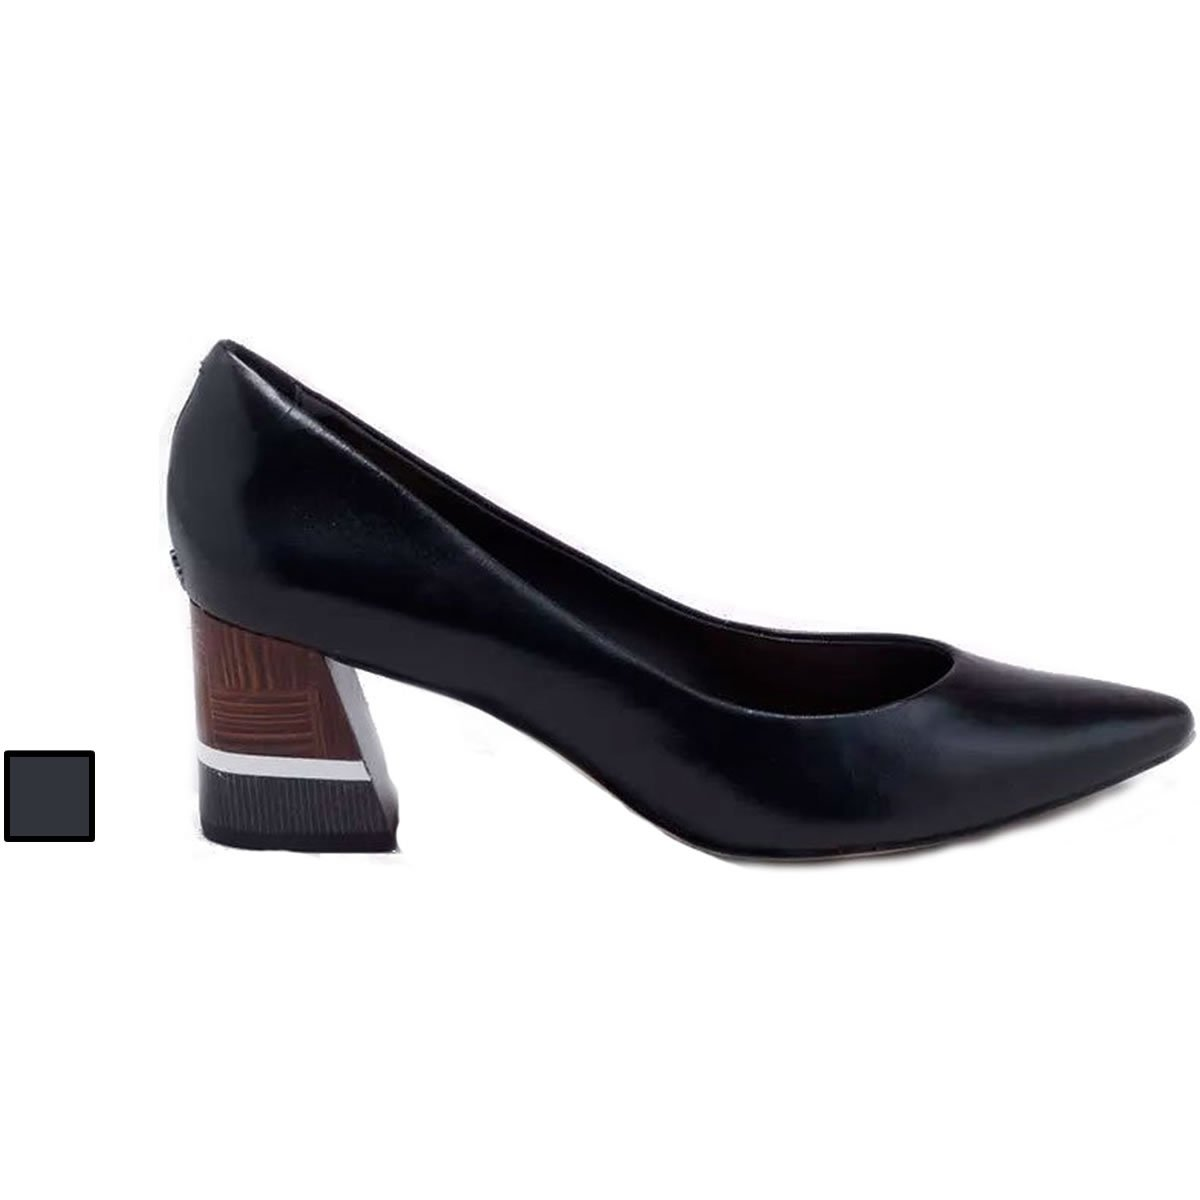 da5c630411d Sapato Scarpin Capodarte Salto Grosso